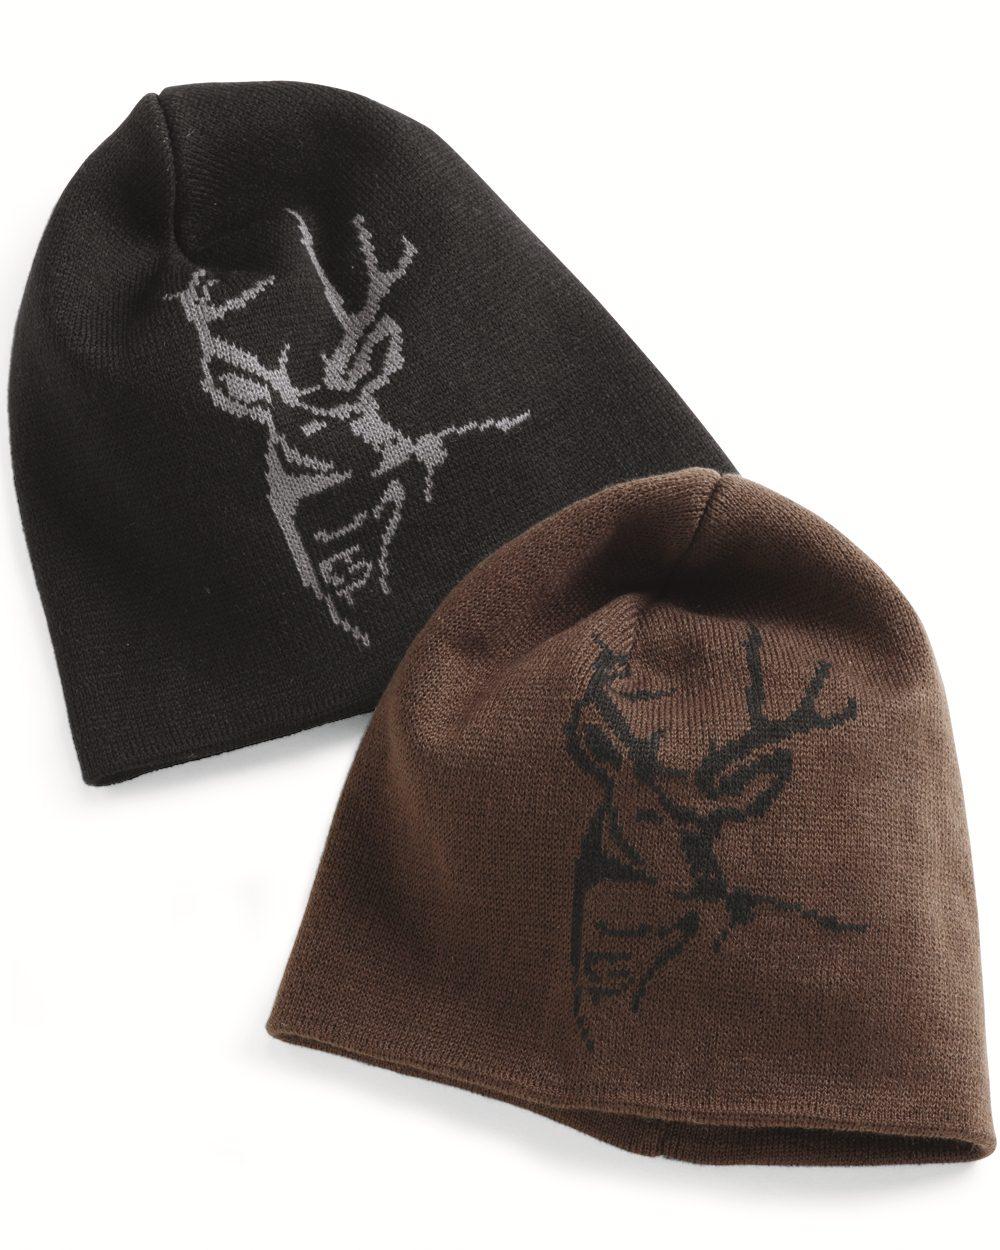 DRI DUCK Wildlife Buck Knit Cap - 3521